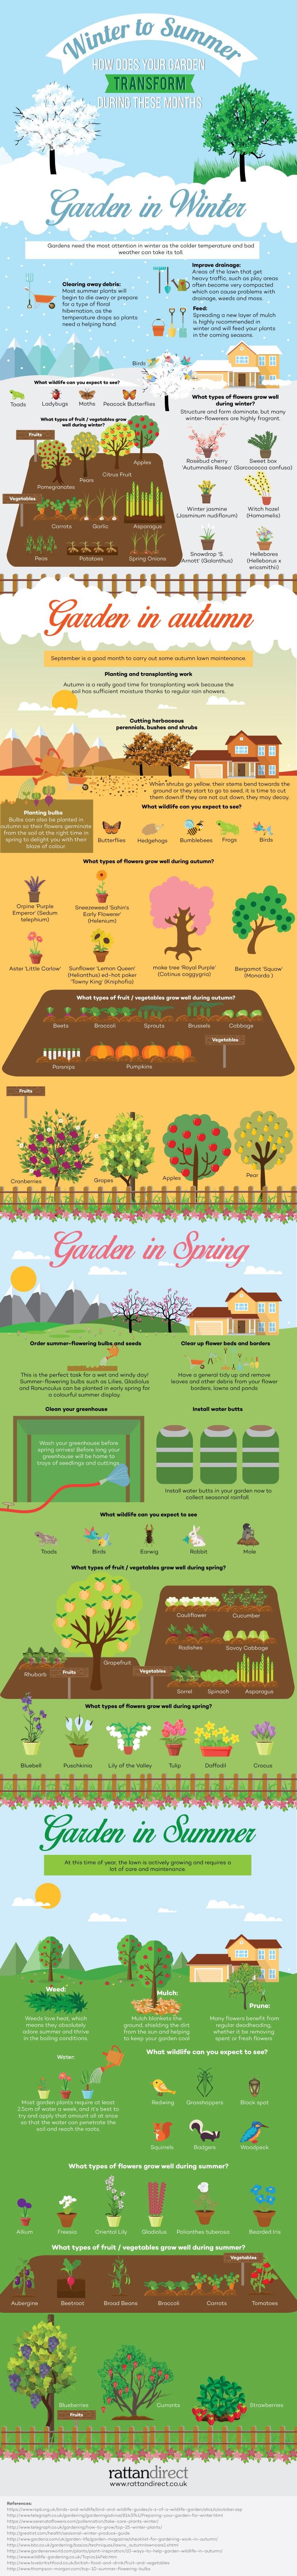 How Your Garden Transforms Through the Seasons (Infographic)